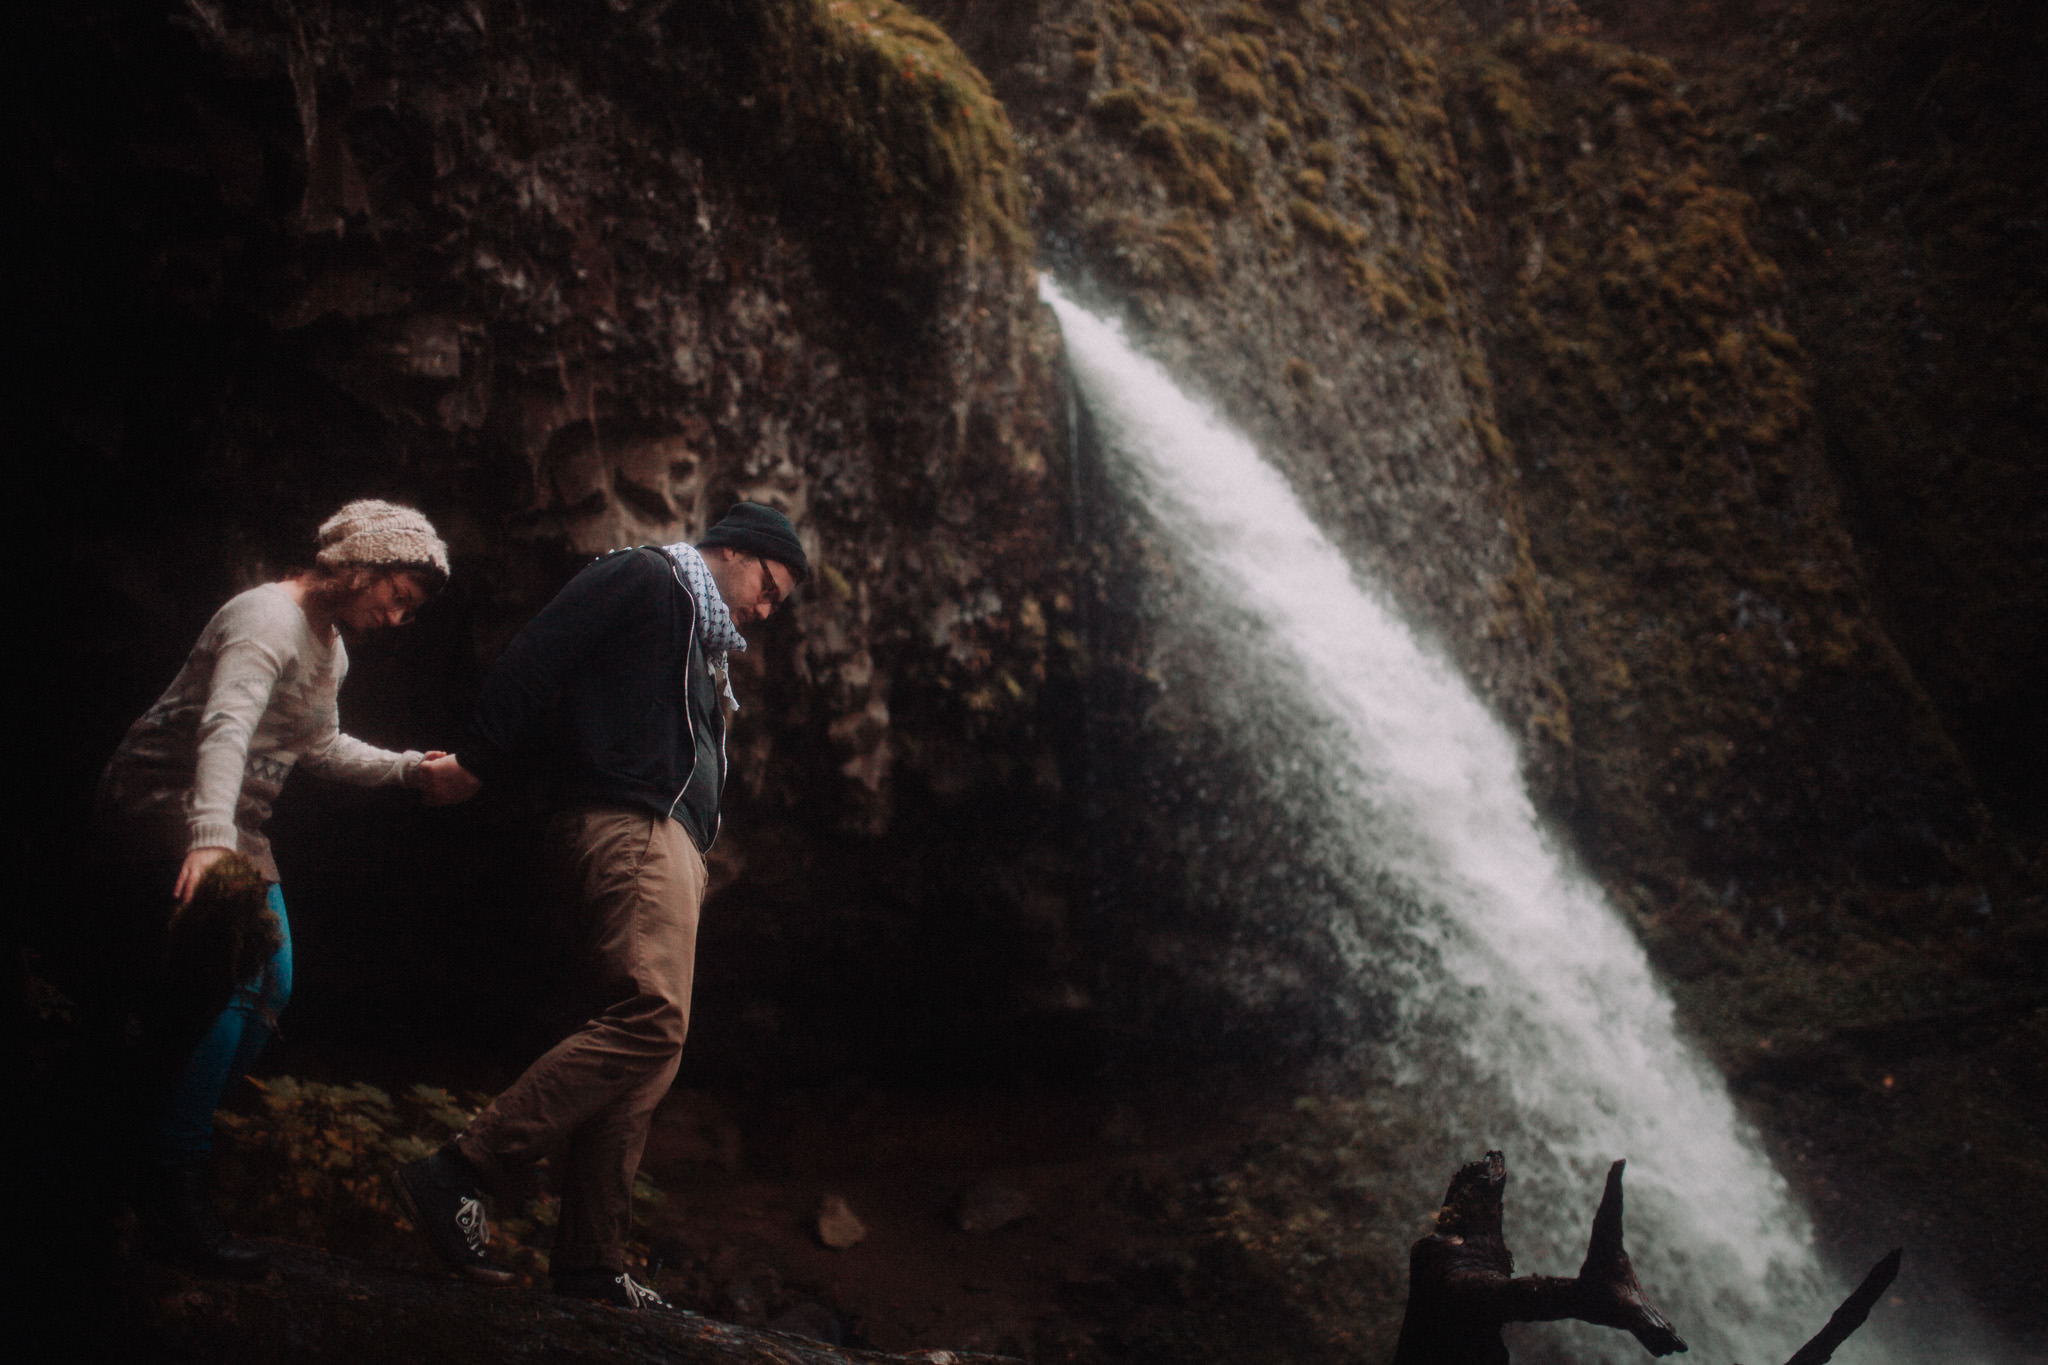 oregon-wedding-elopement-photographer-donmashelen-bringas6